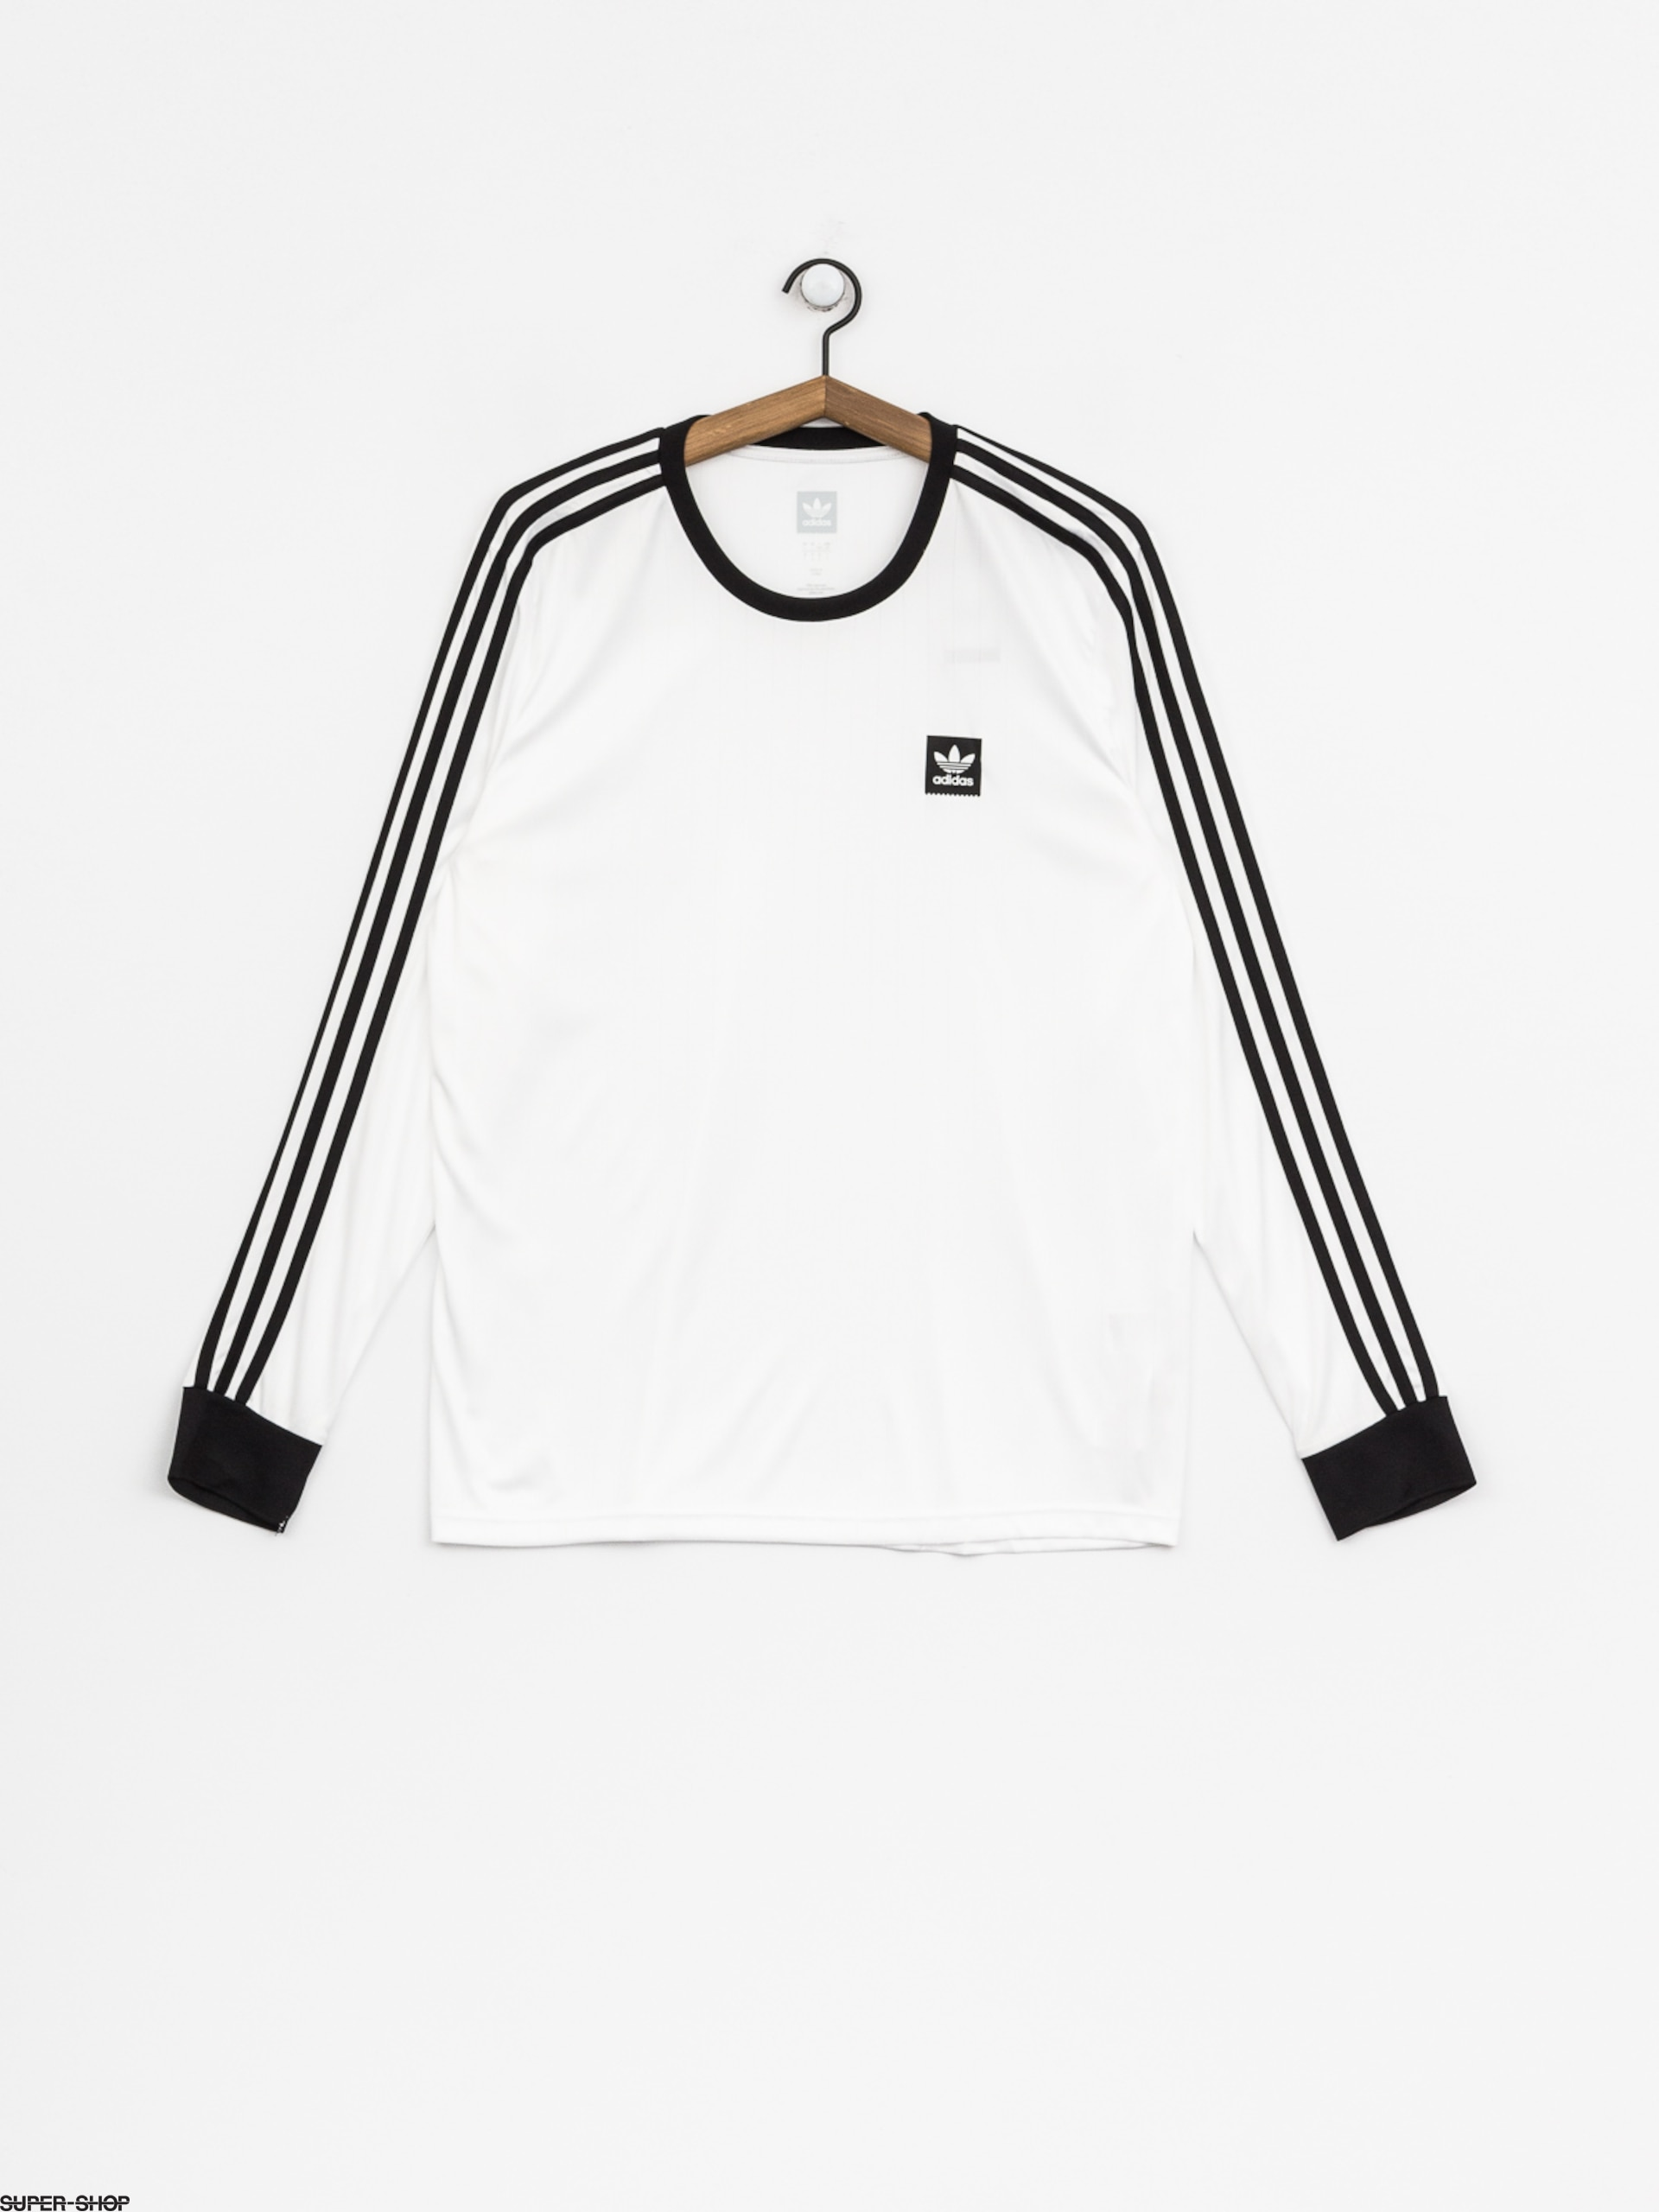 adidas Longsleeve Club Jersey (white black) c2e57ebdd